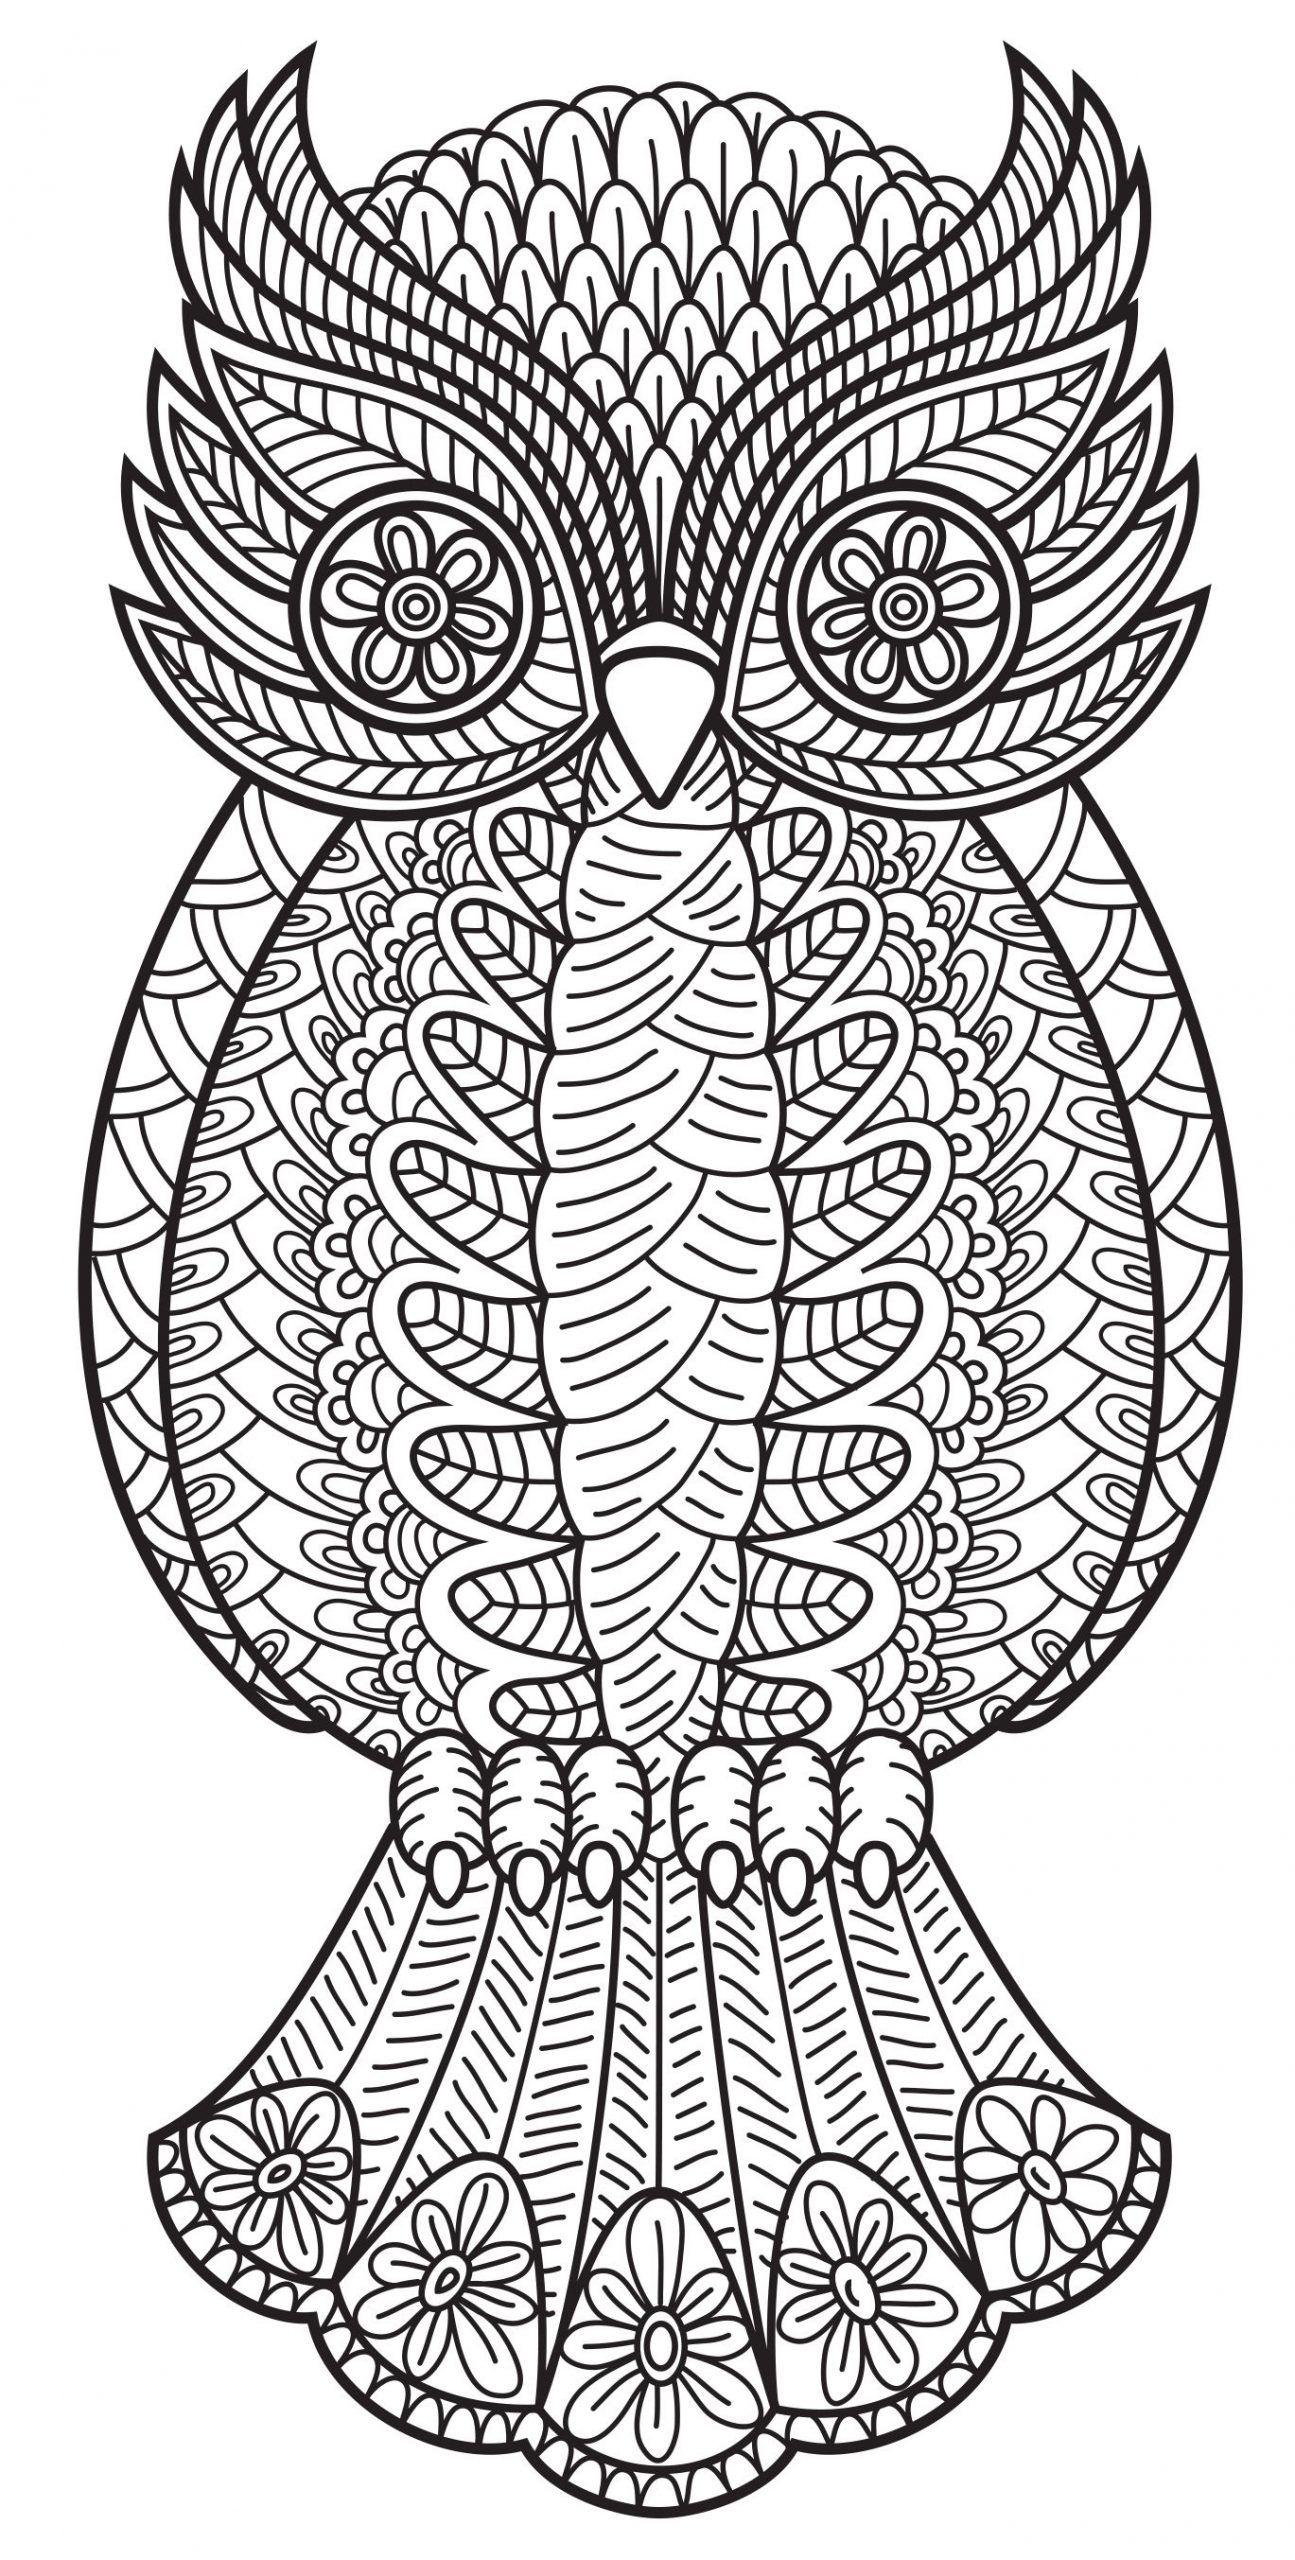 Malvorlagen Mandala Eule Owl Coloring Pages Animal Coloring Pages Coloring Books